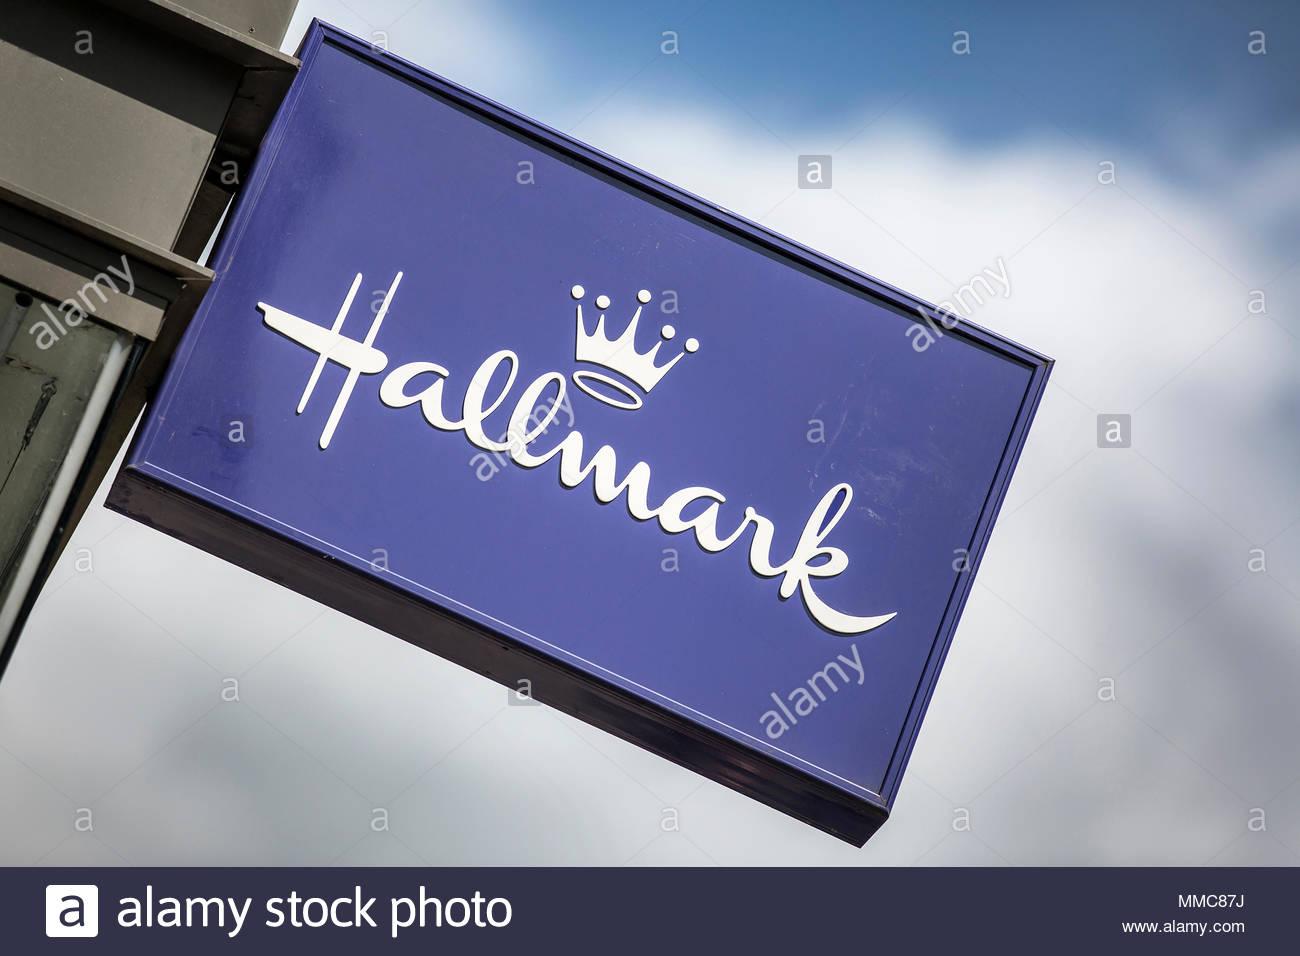 Greeting card shops stock photos greeting card shops stock images hallmark shop in leeds stock image m4hsunfo